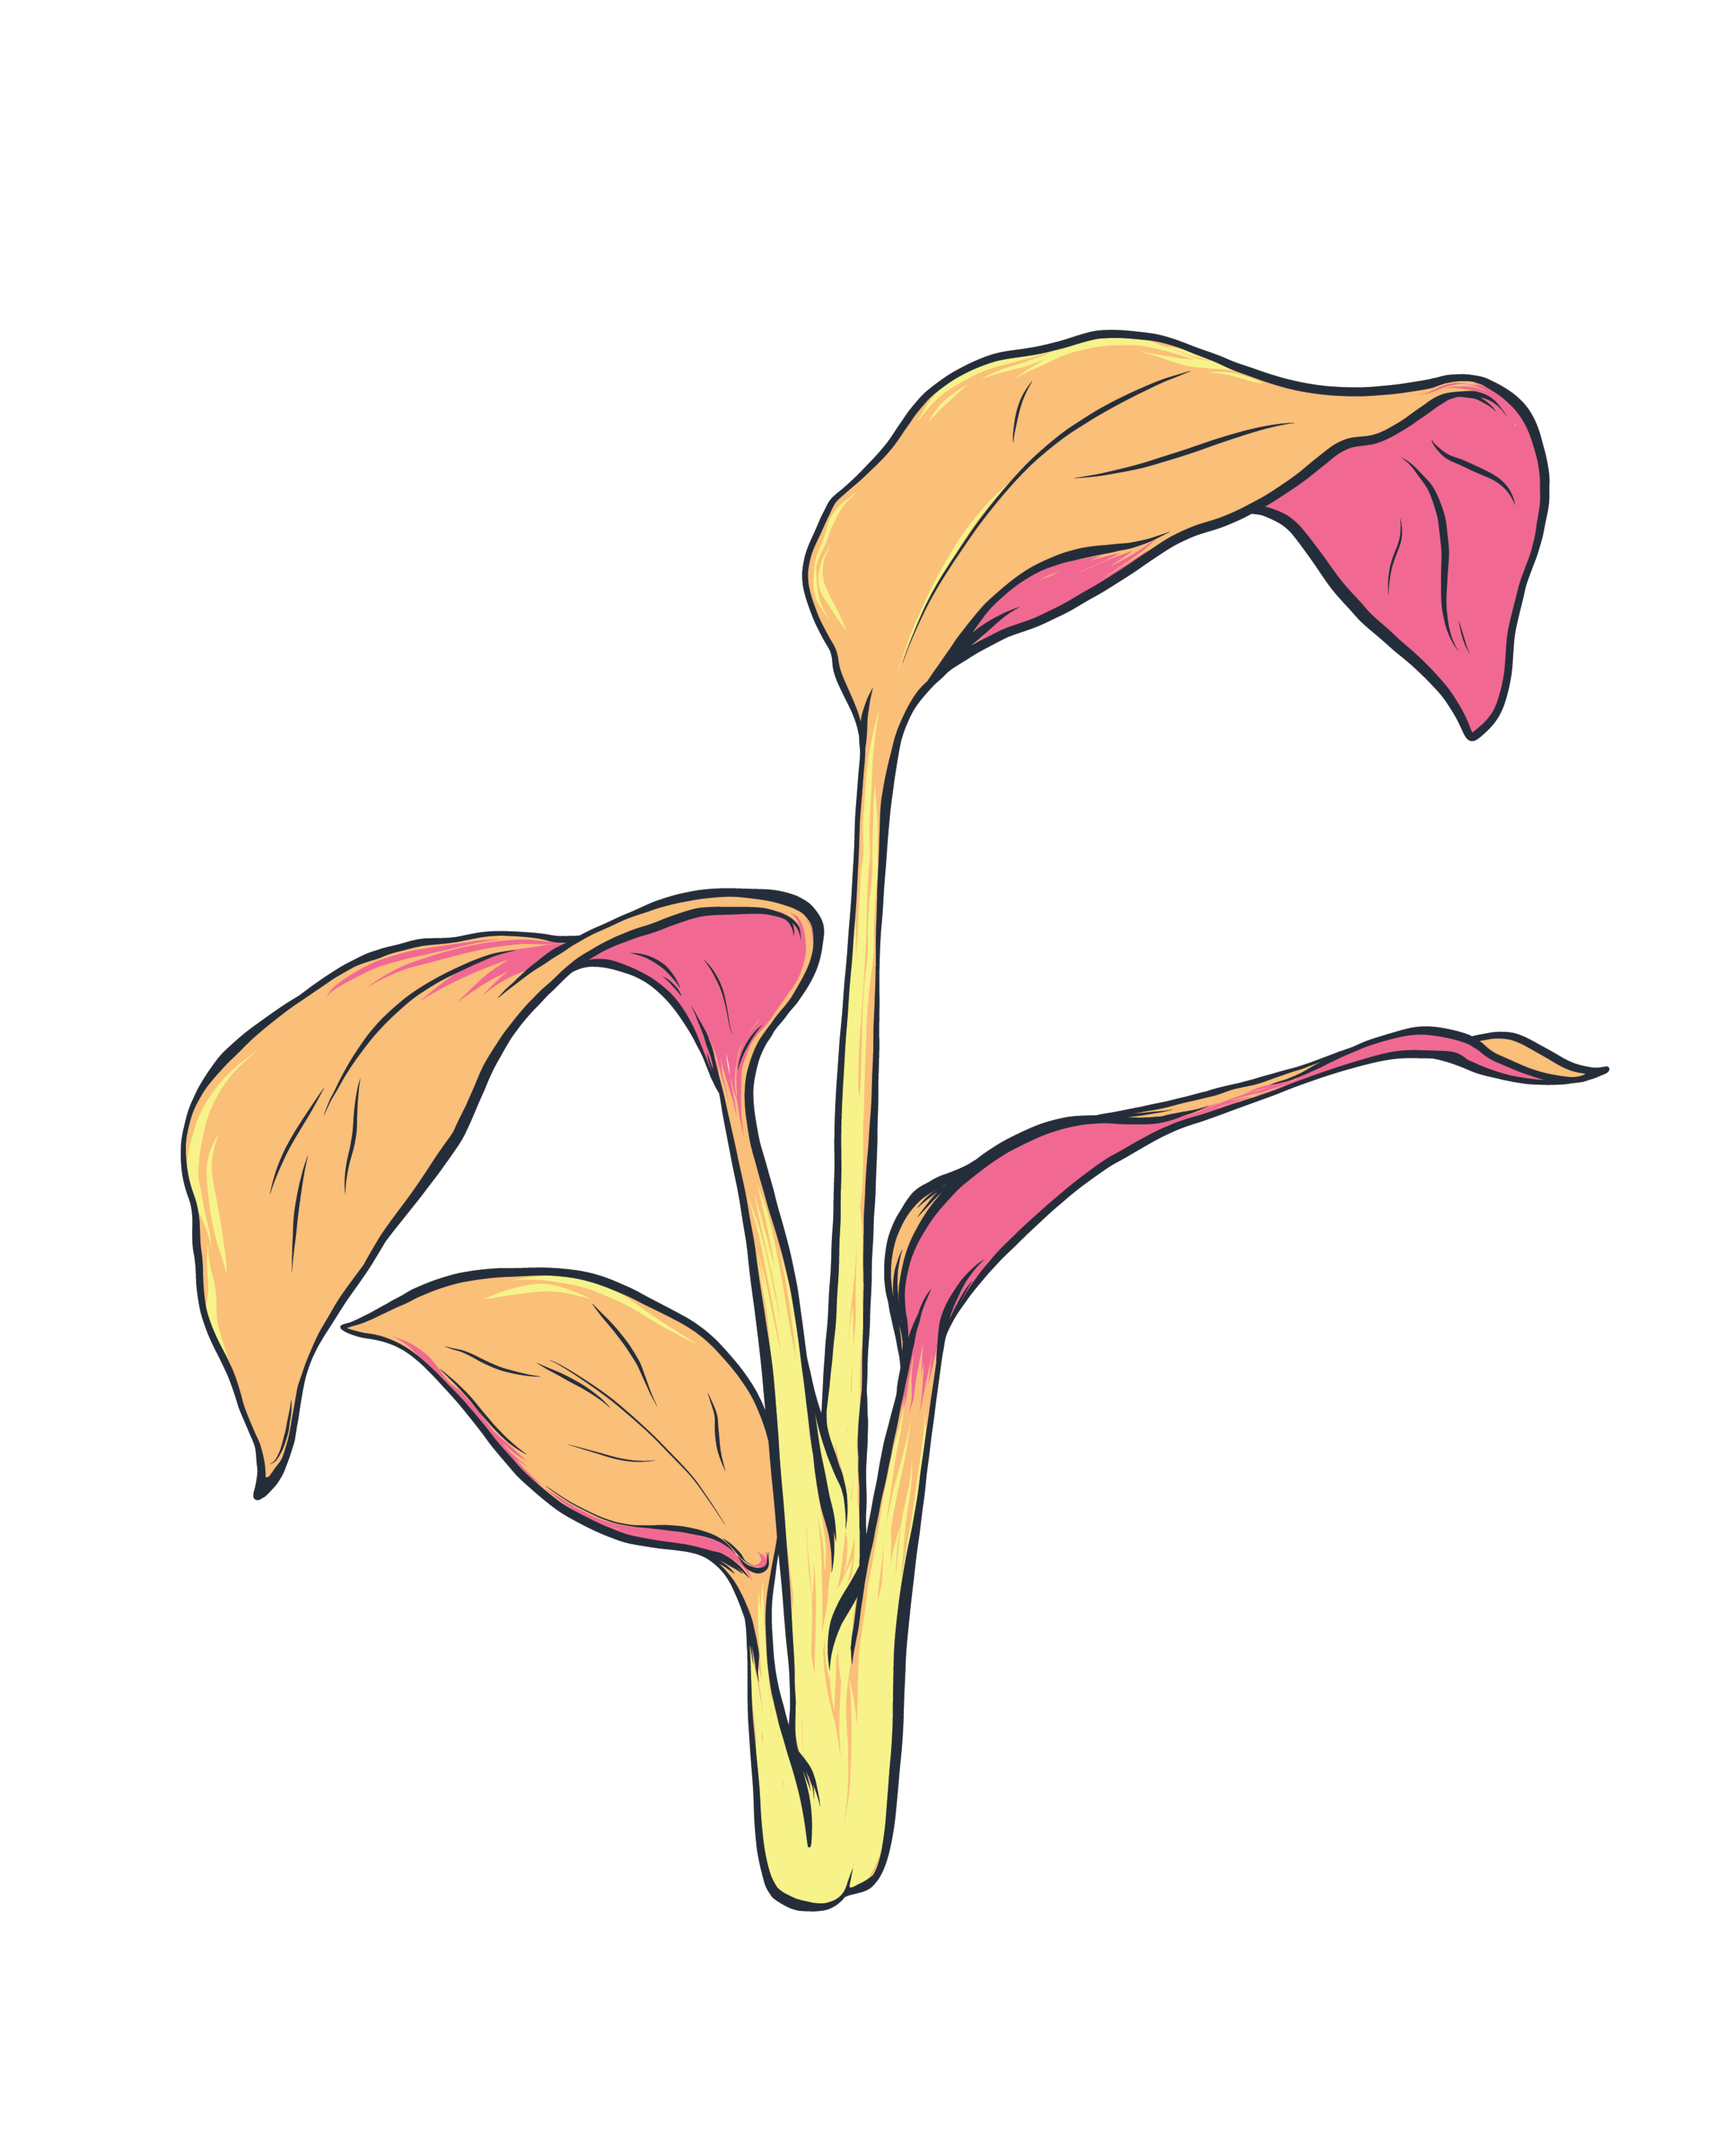 Artboard 3plants.png